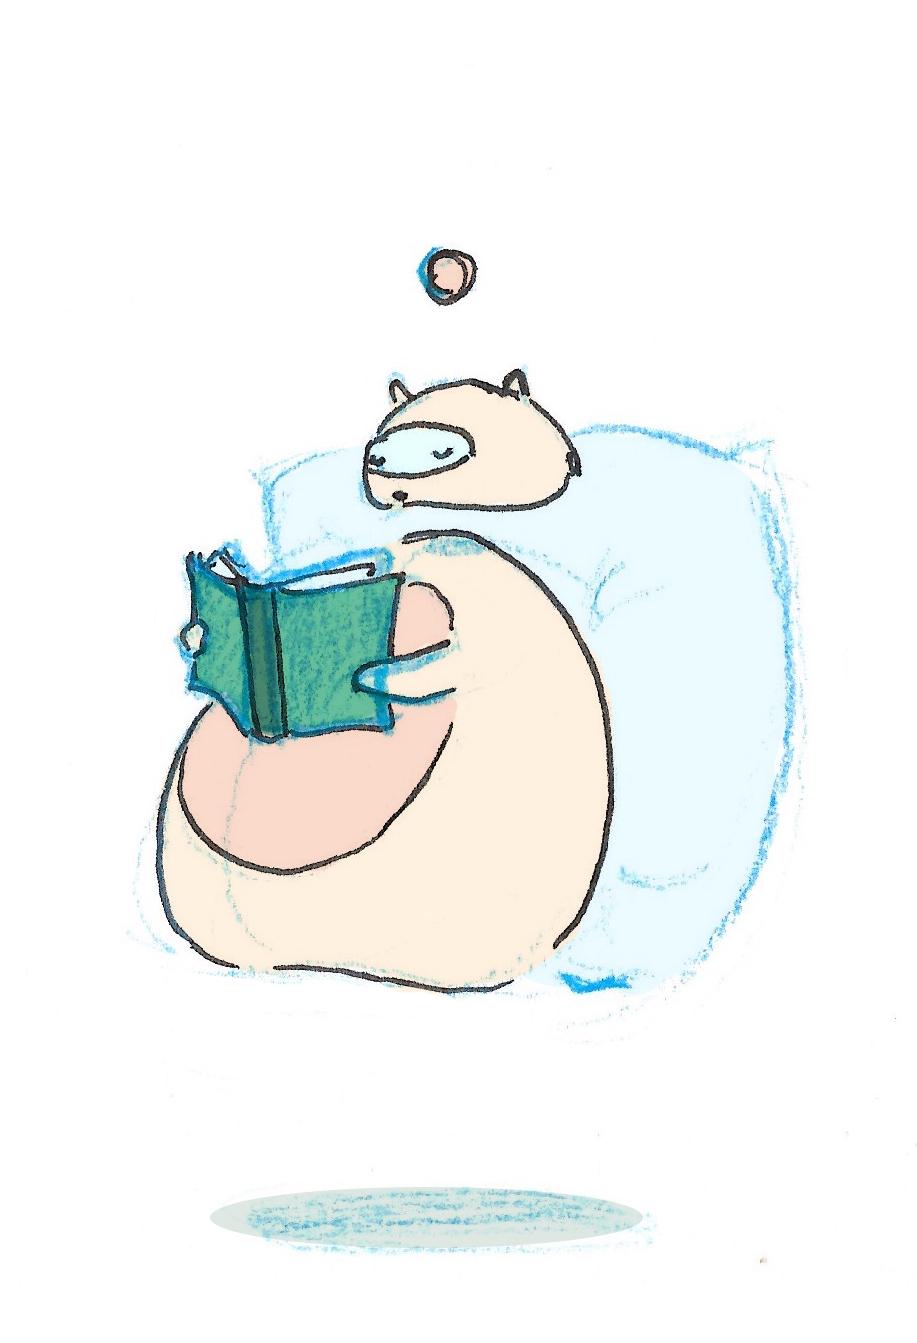 Babaoo_reading copy.png